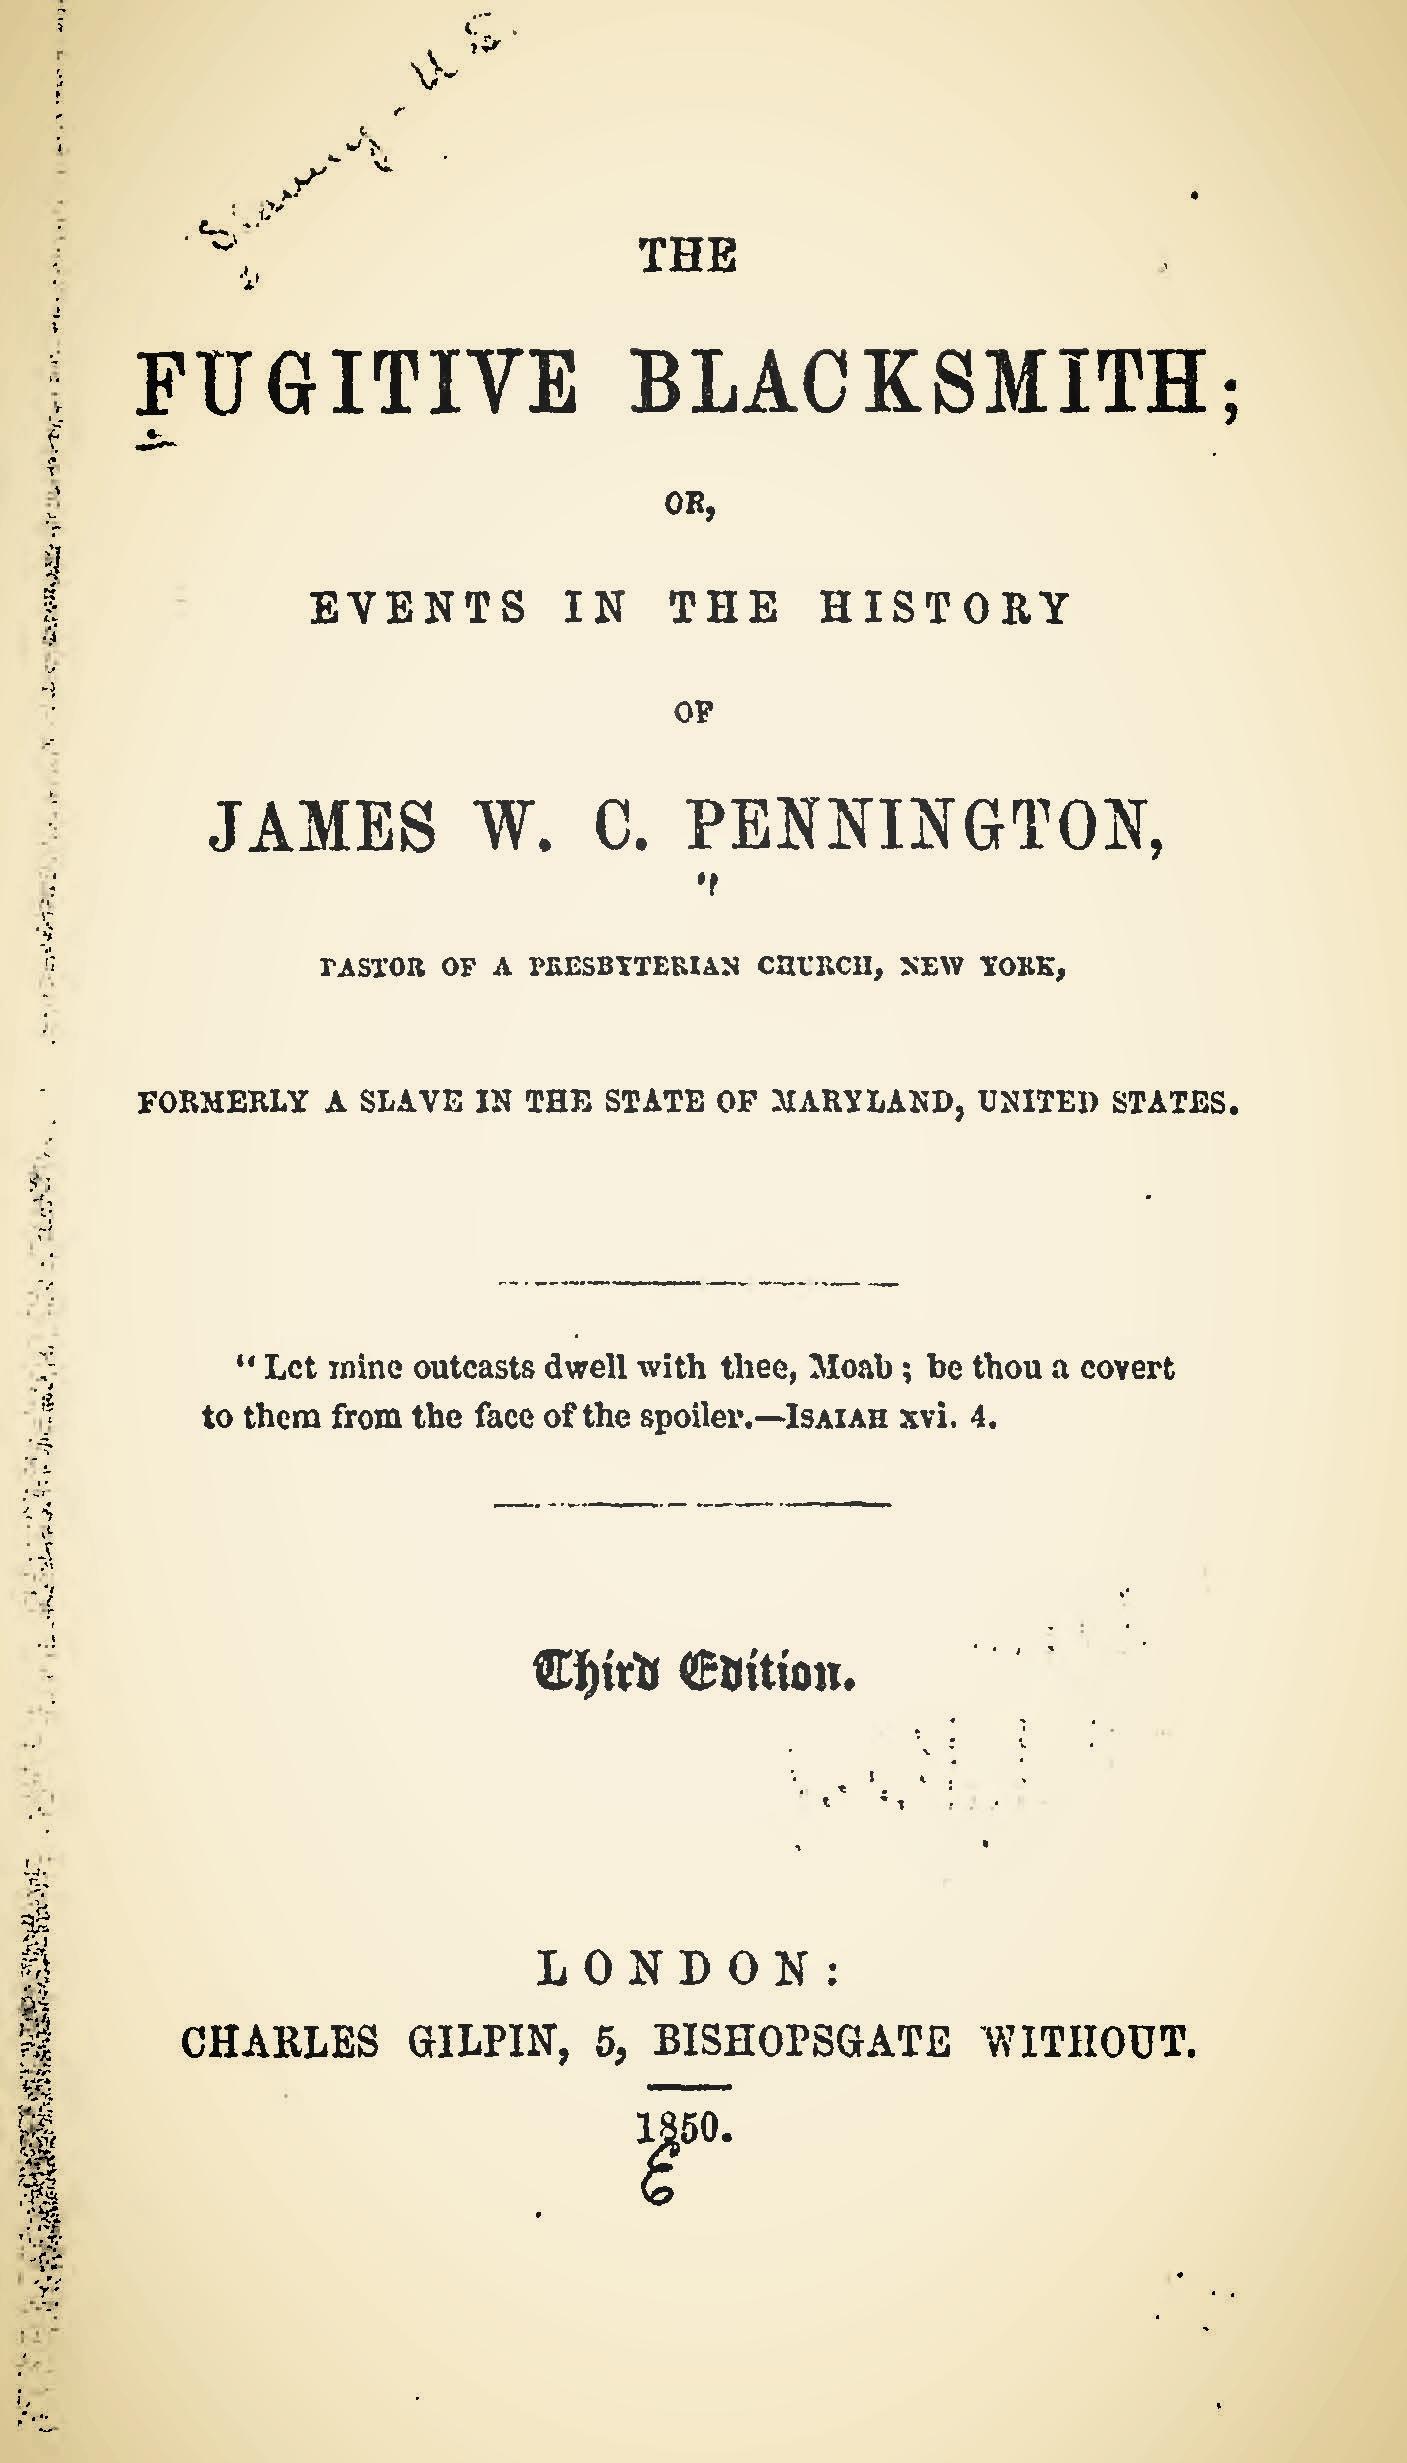 Pennington, James W.C., The Fugitive Blacksmith Title Page.jpg